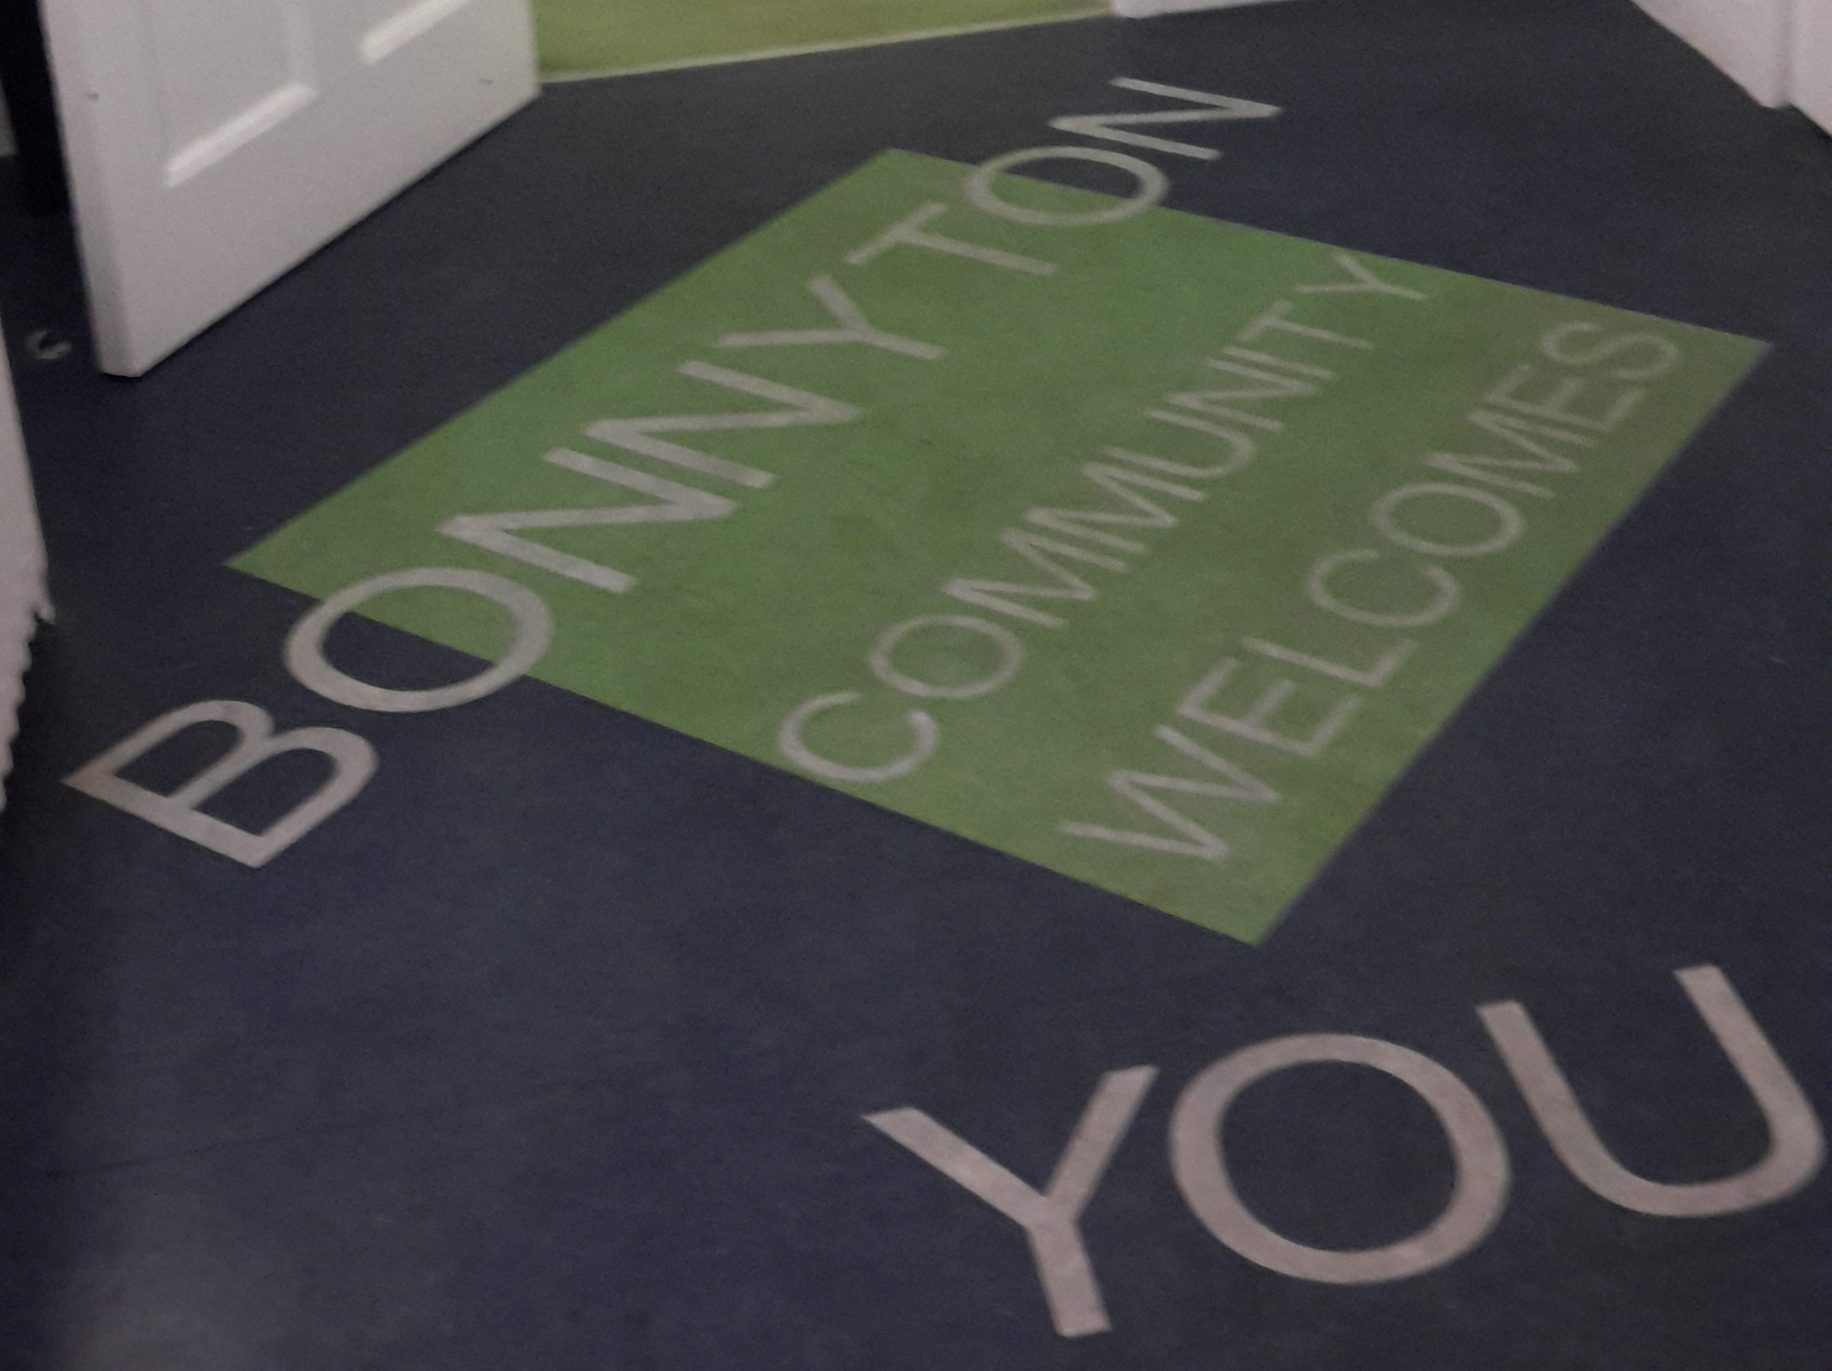 Bonnyton Community Centre